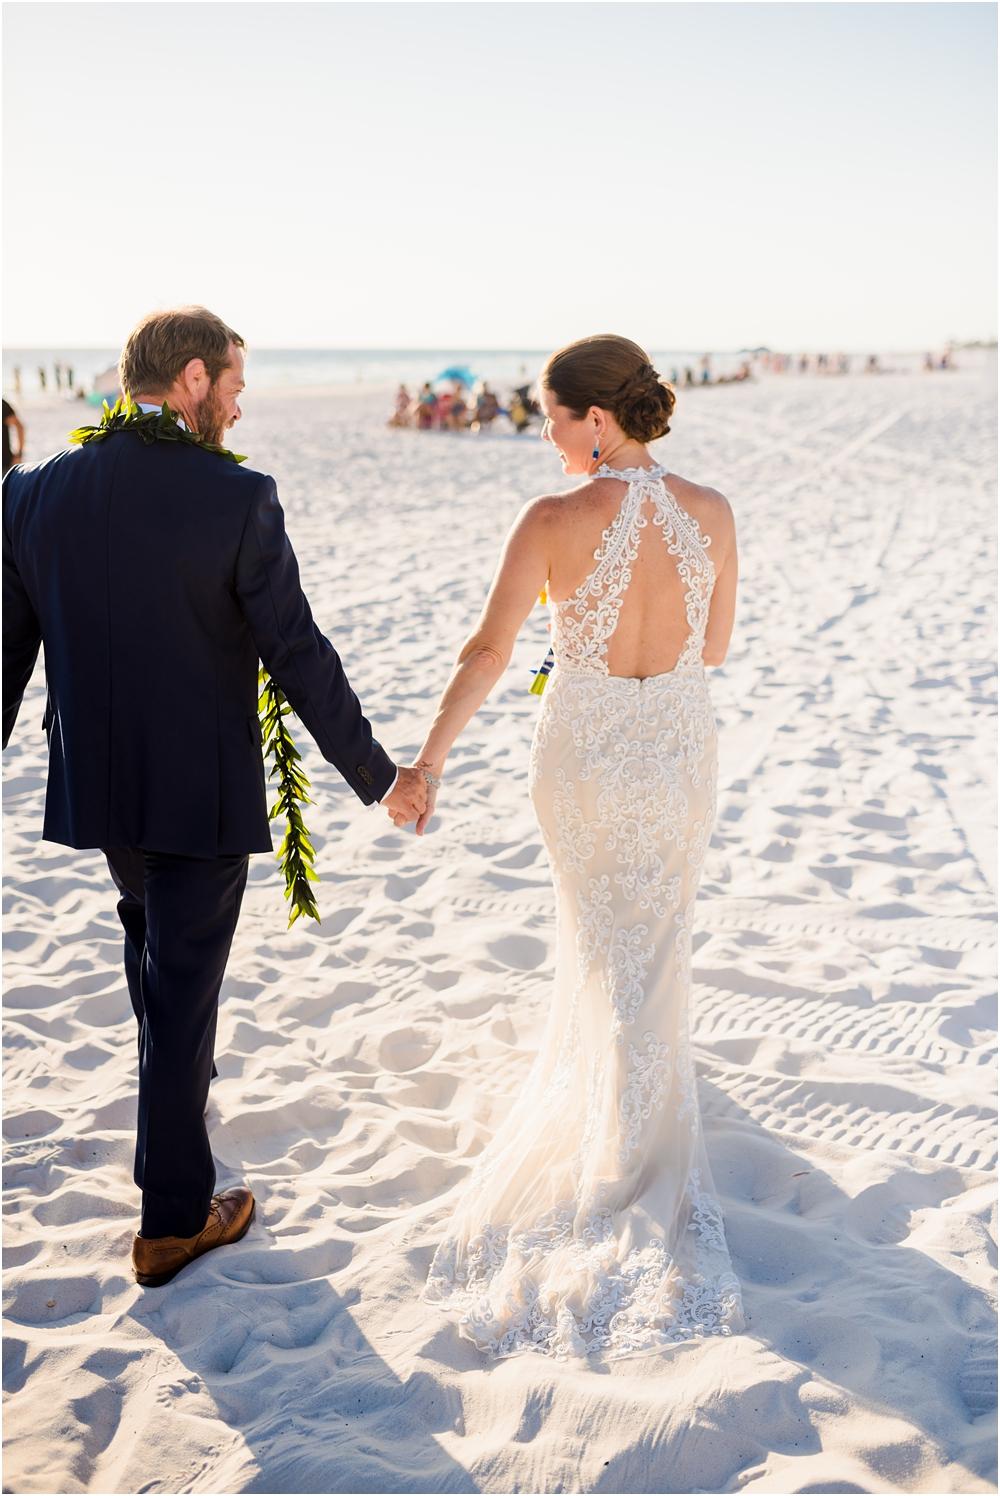 ledman-wedding-kiersten-stevenson-photography-30a-panama-city-beach-dothan-tallahassee-(260-of-763).JPG